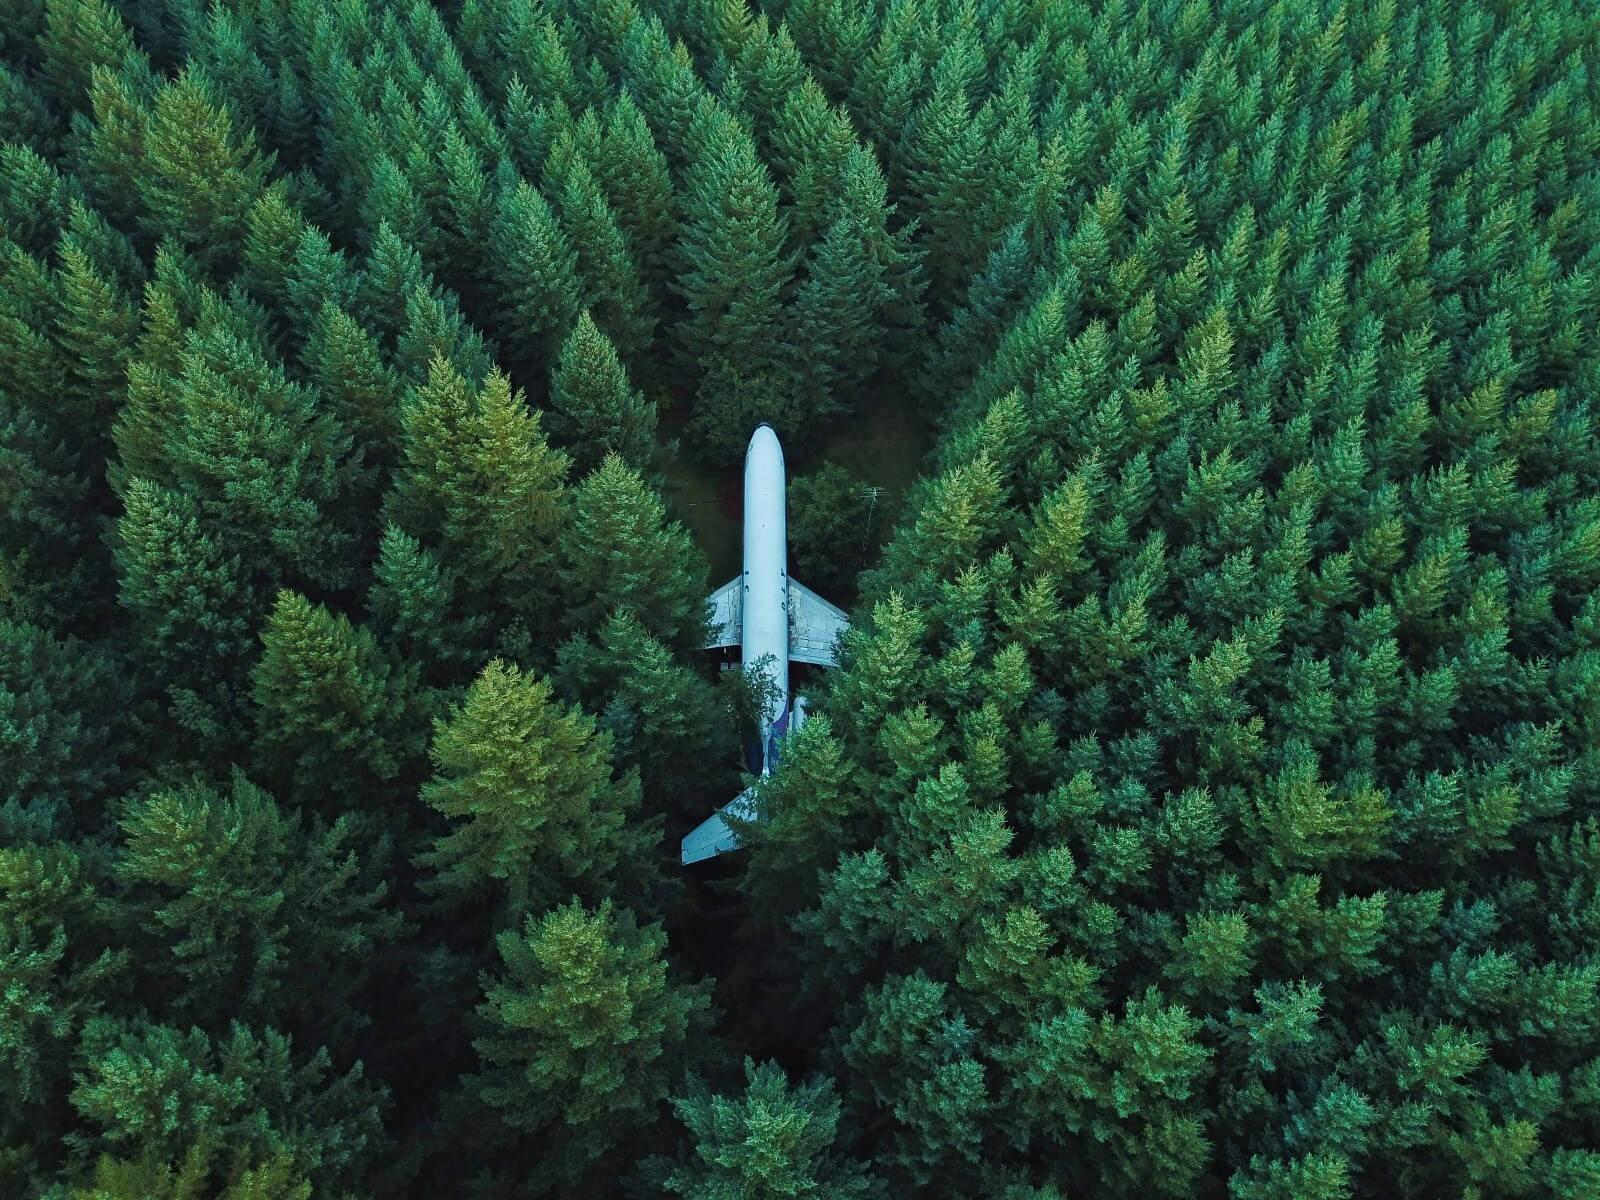 Vliegtuig in het bos